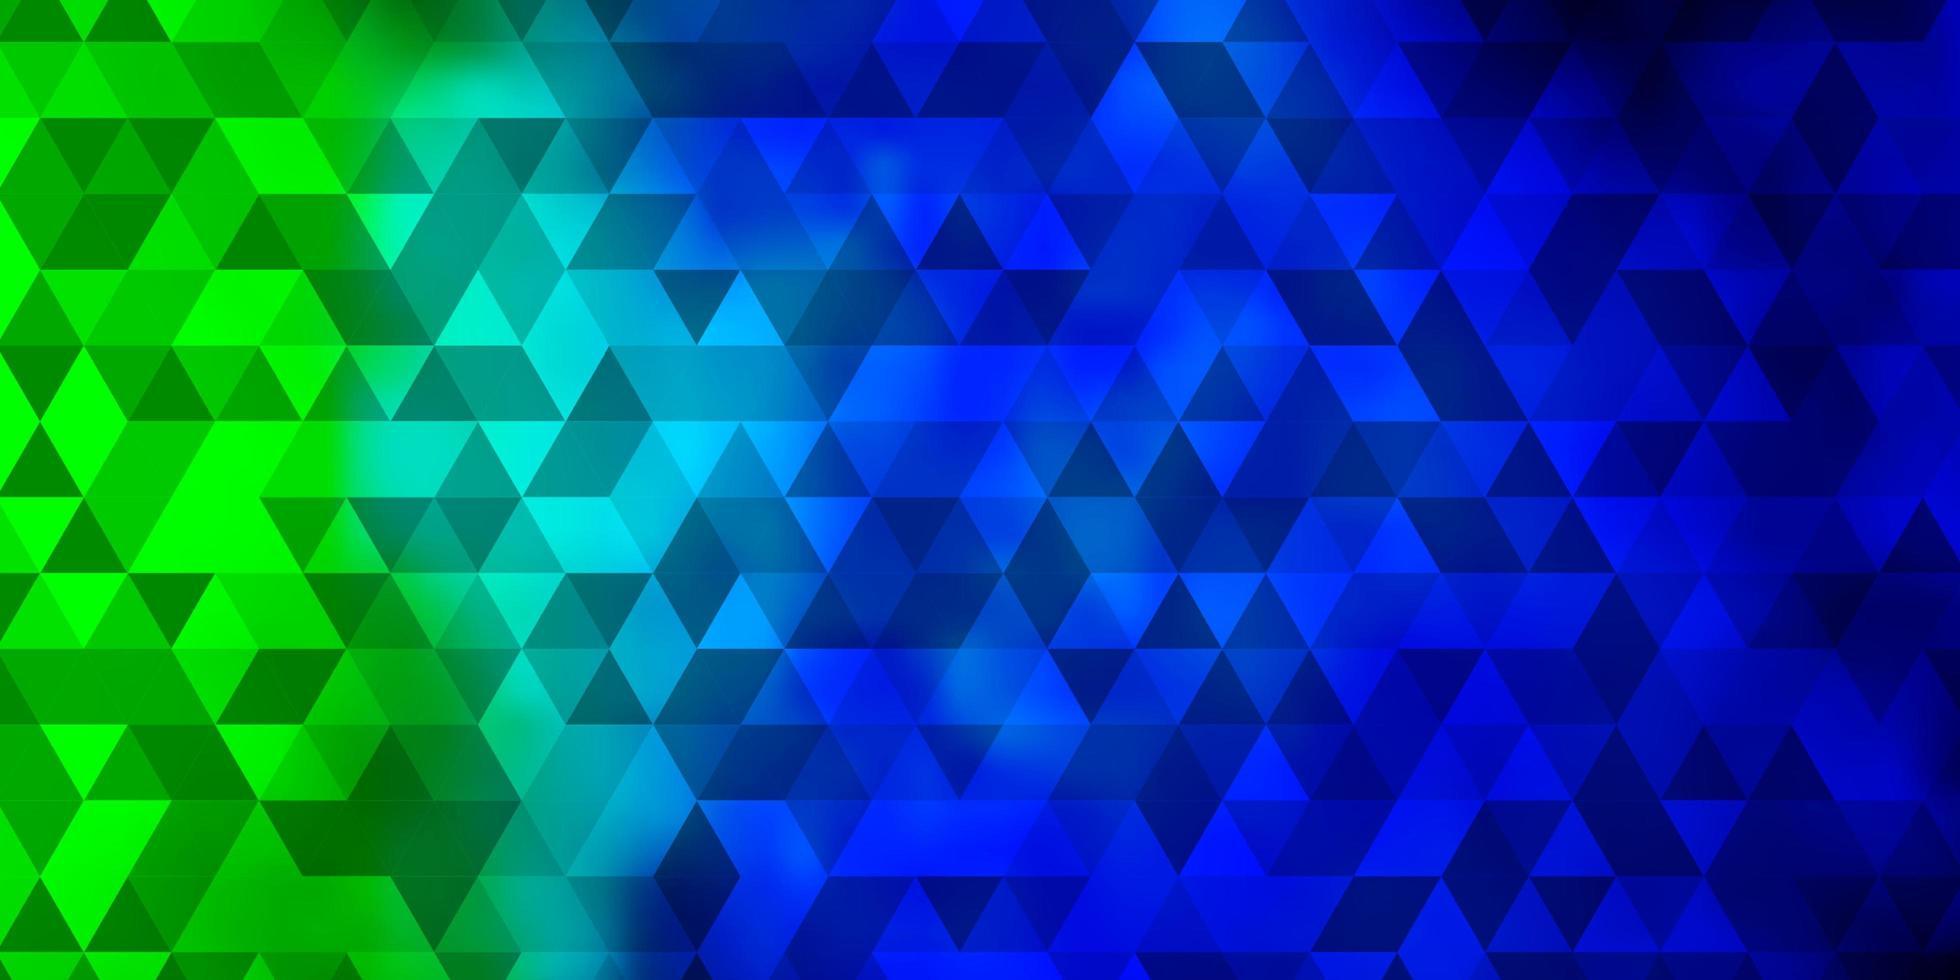 ljusblå, grön vektorbakgrund med polygonal stil. vektor